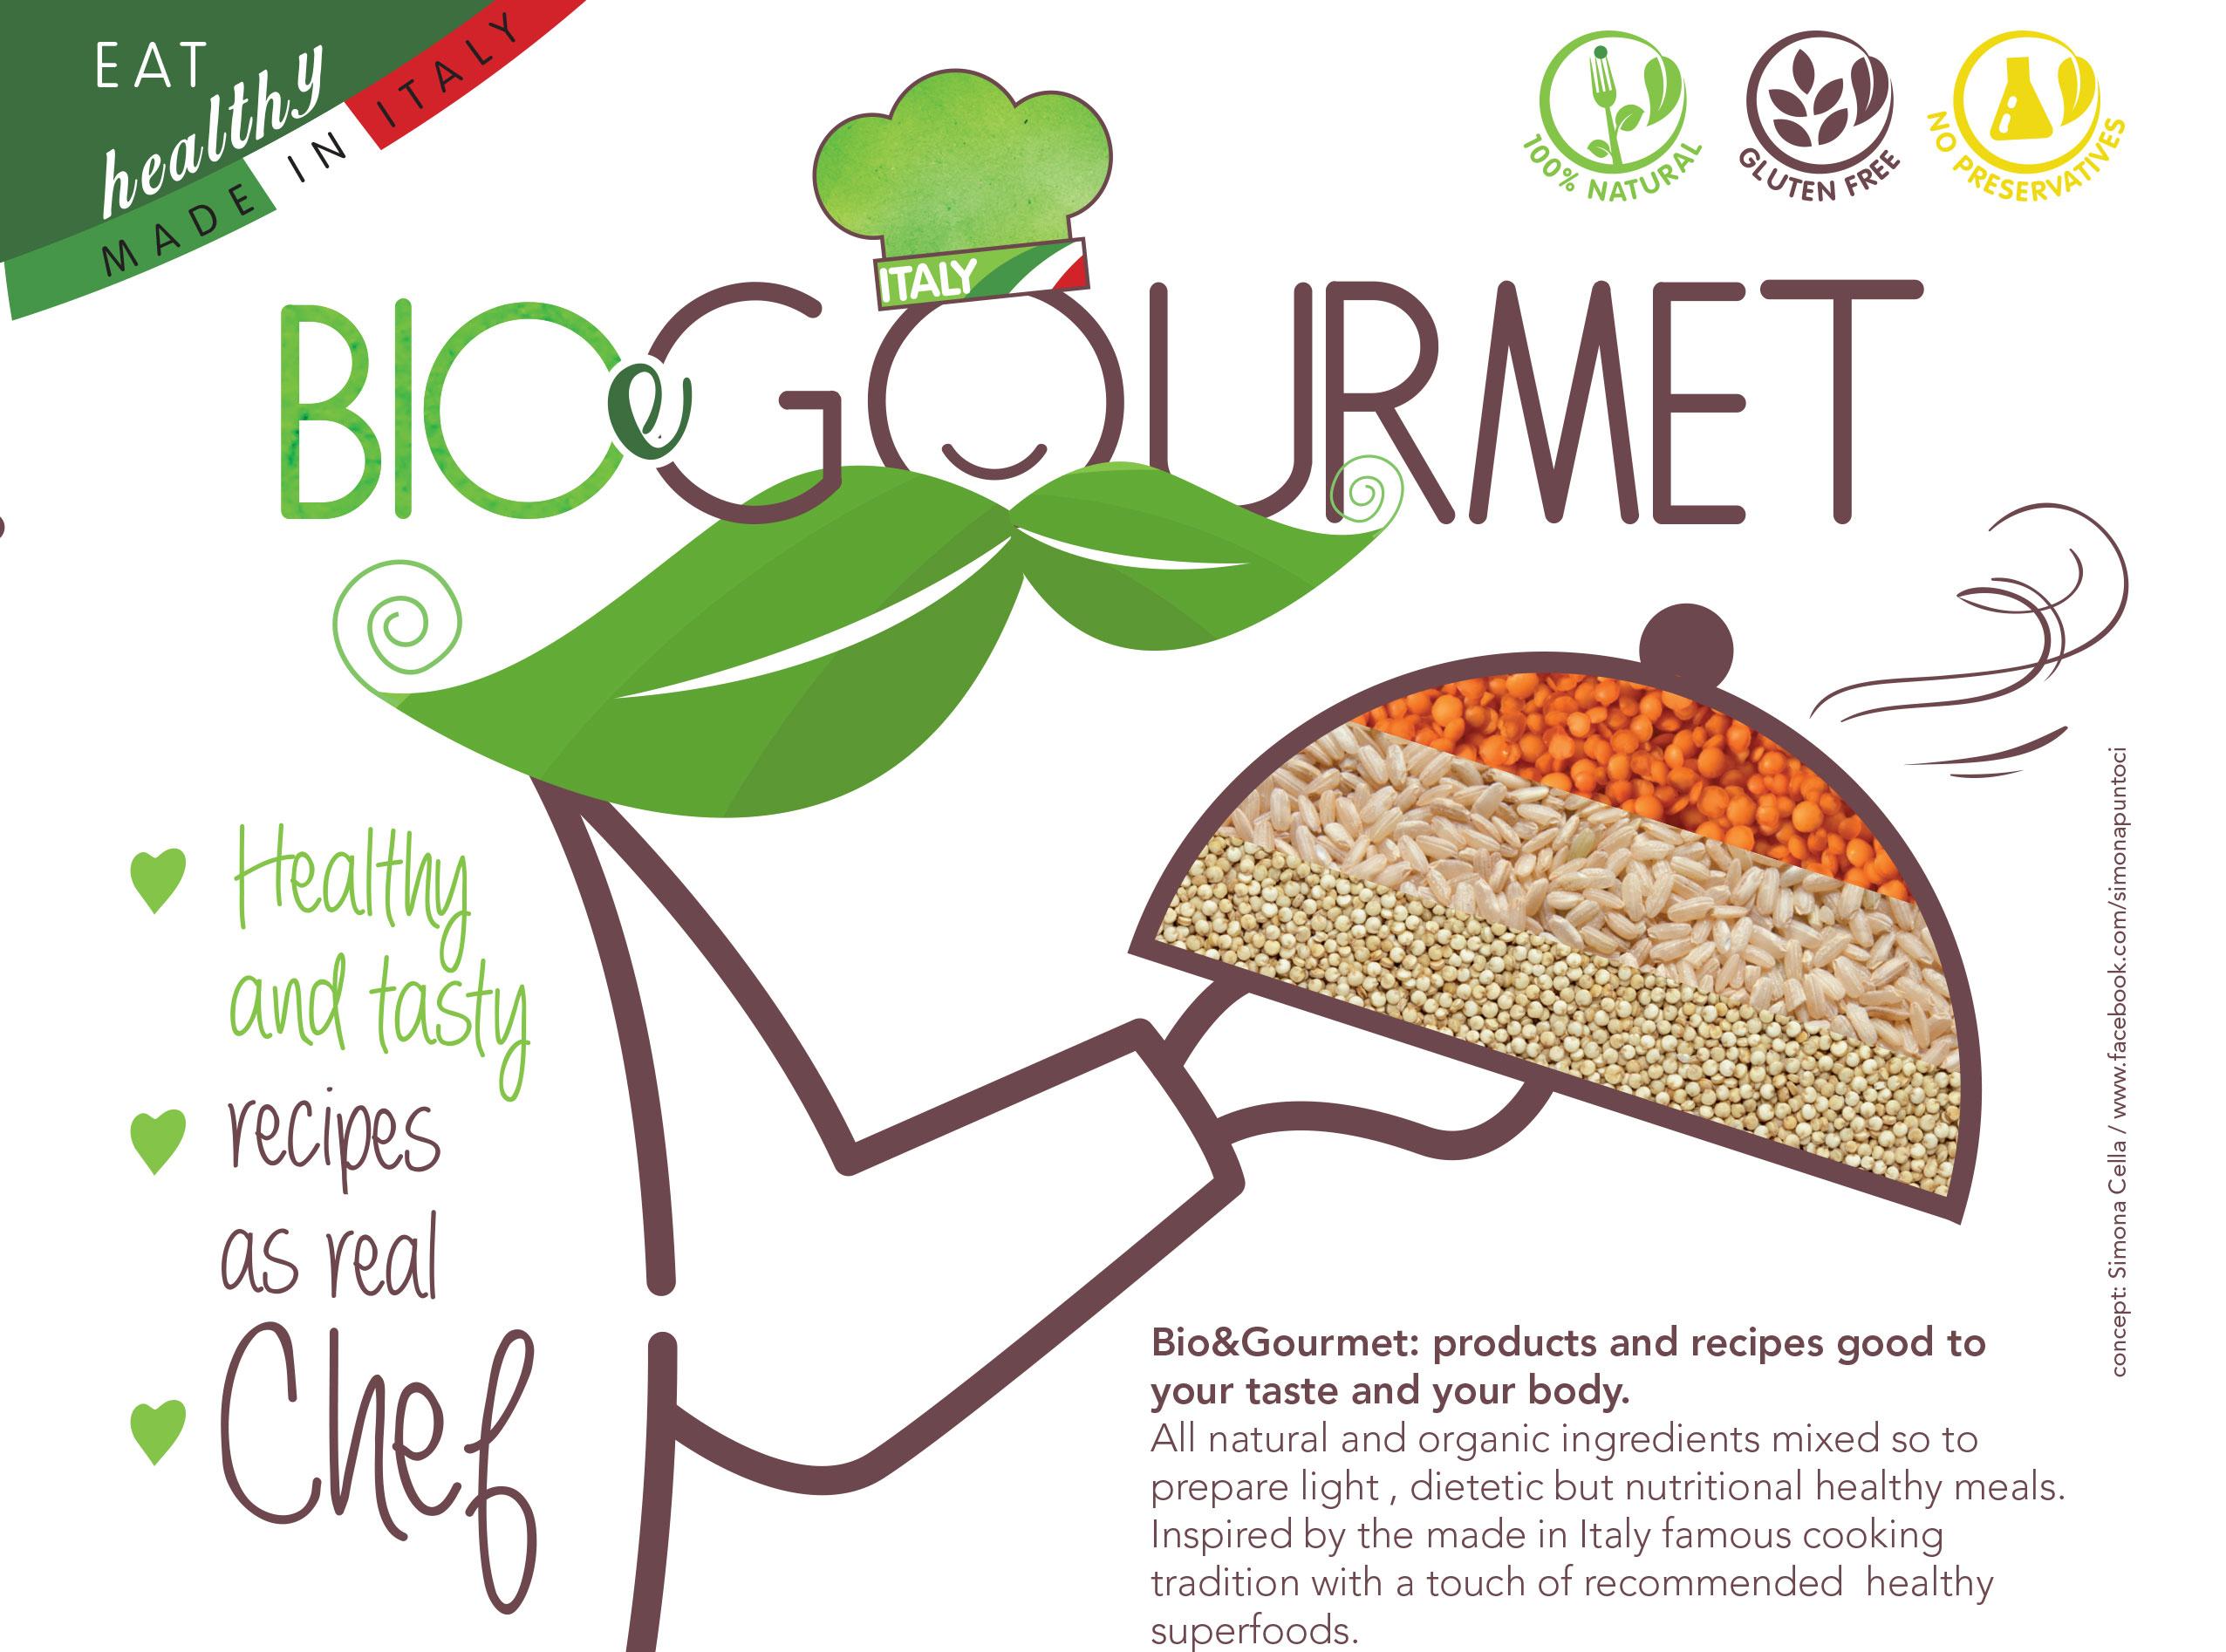 Un esempio di food revolution: Biogourmet